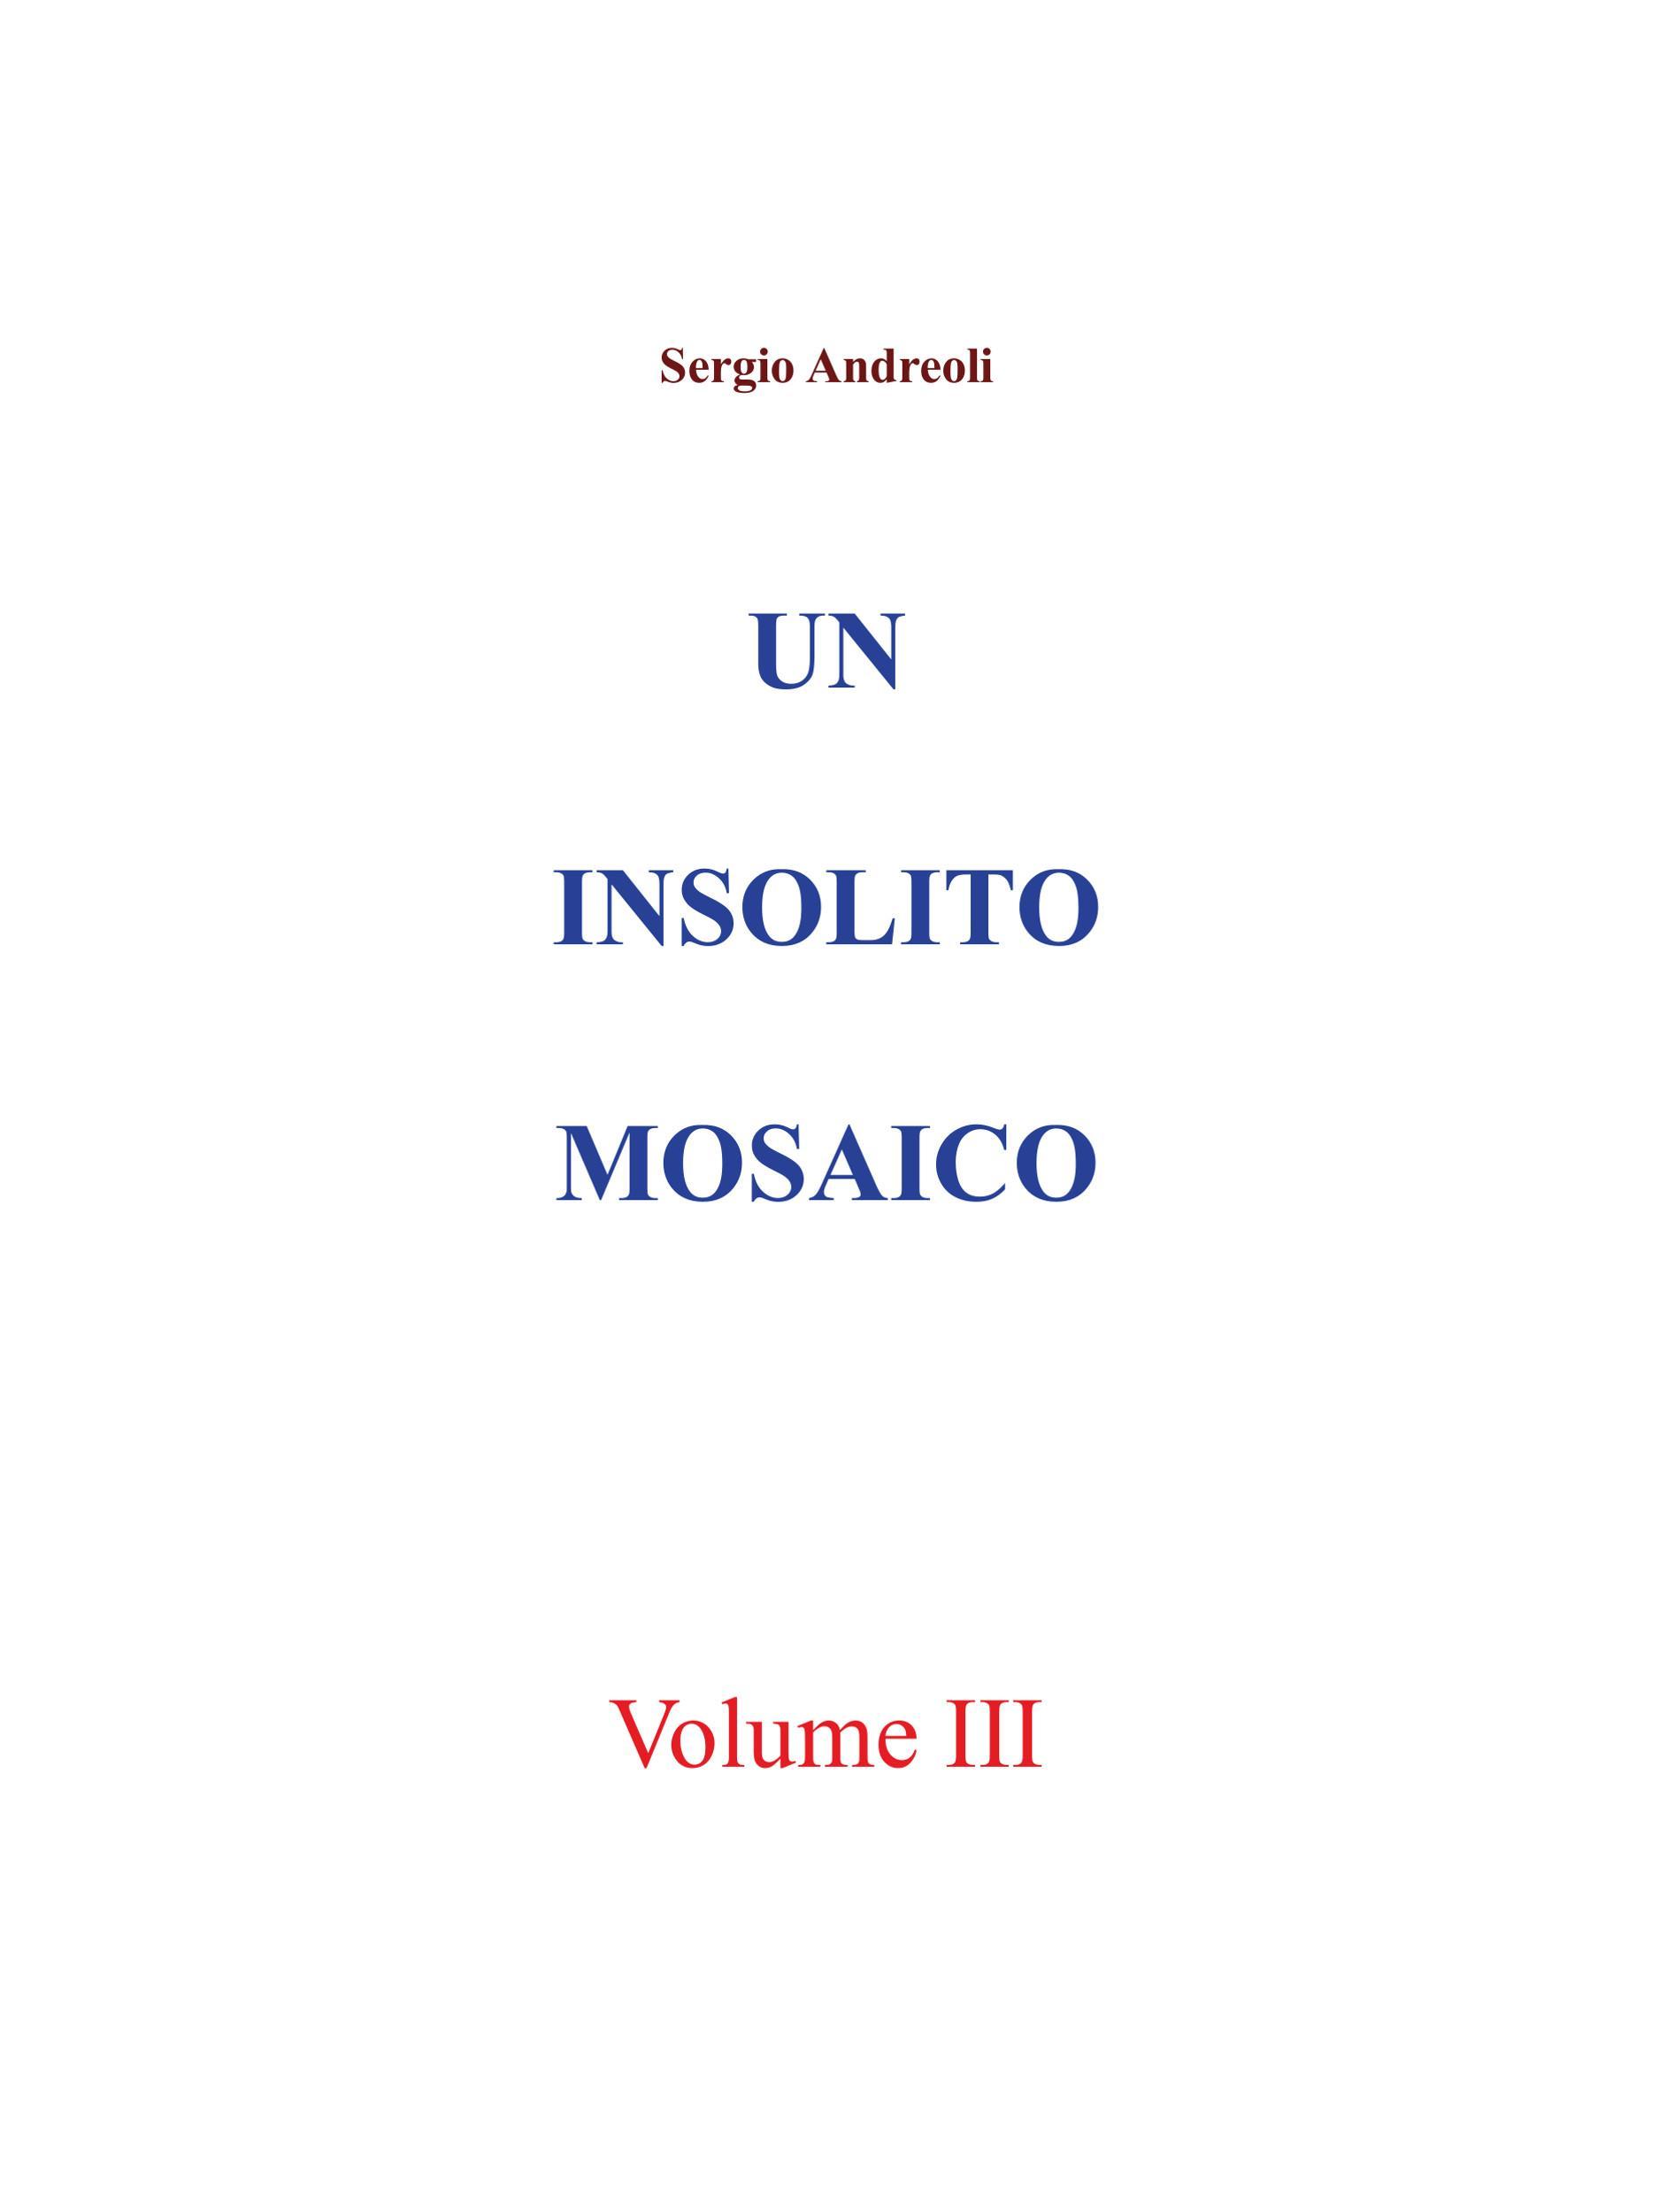 Un insolito mosaico. Vol. 3